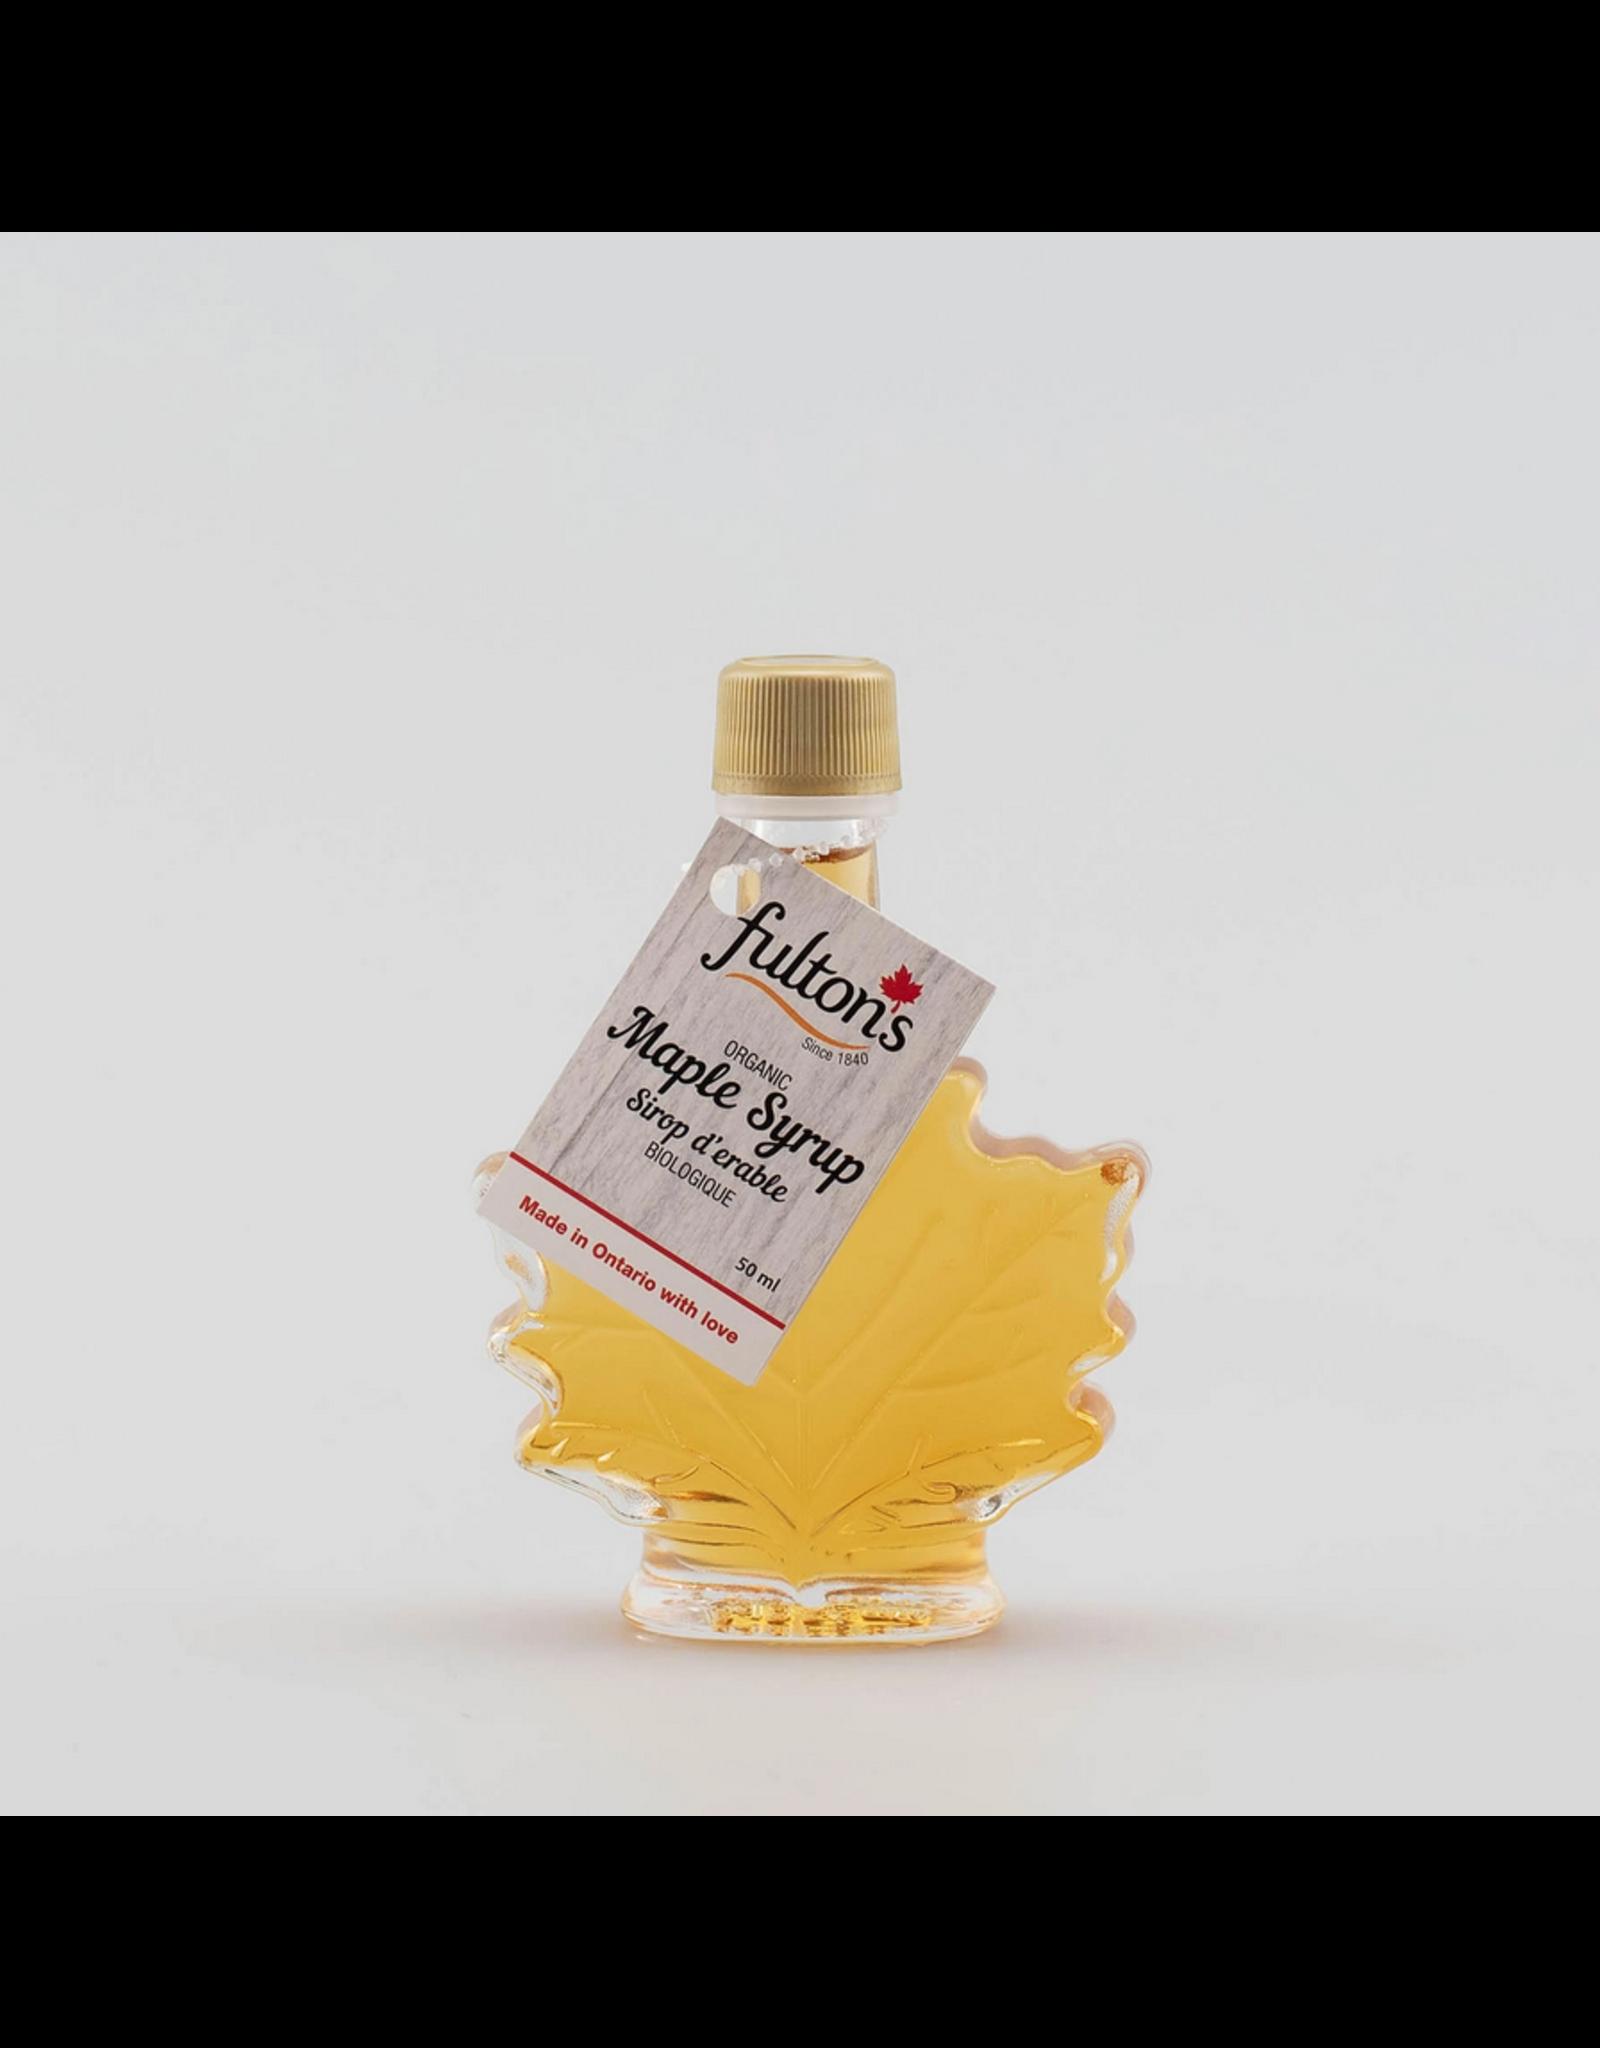 Fulton's Fulton's Maple Syrup 50ml Leaf